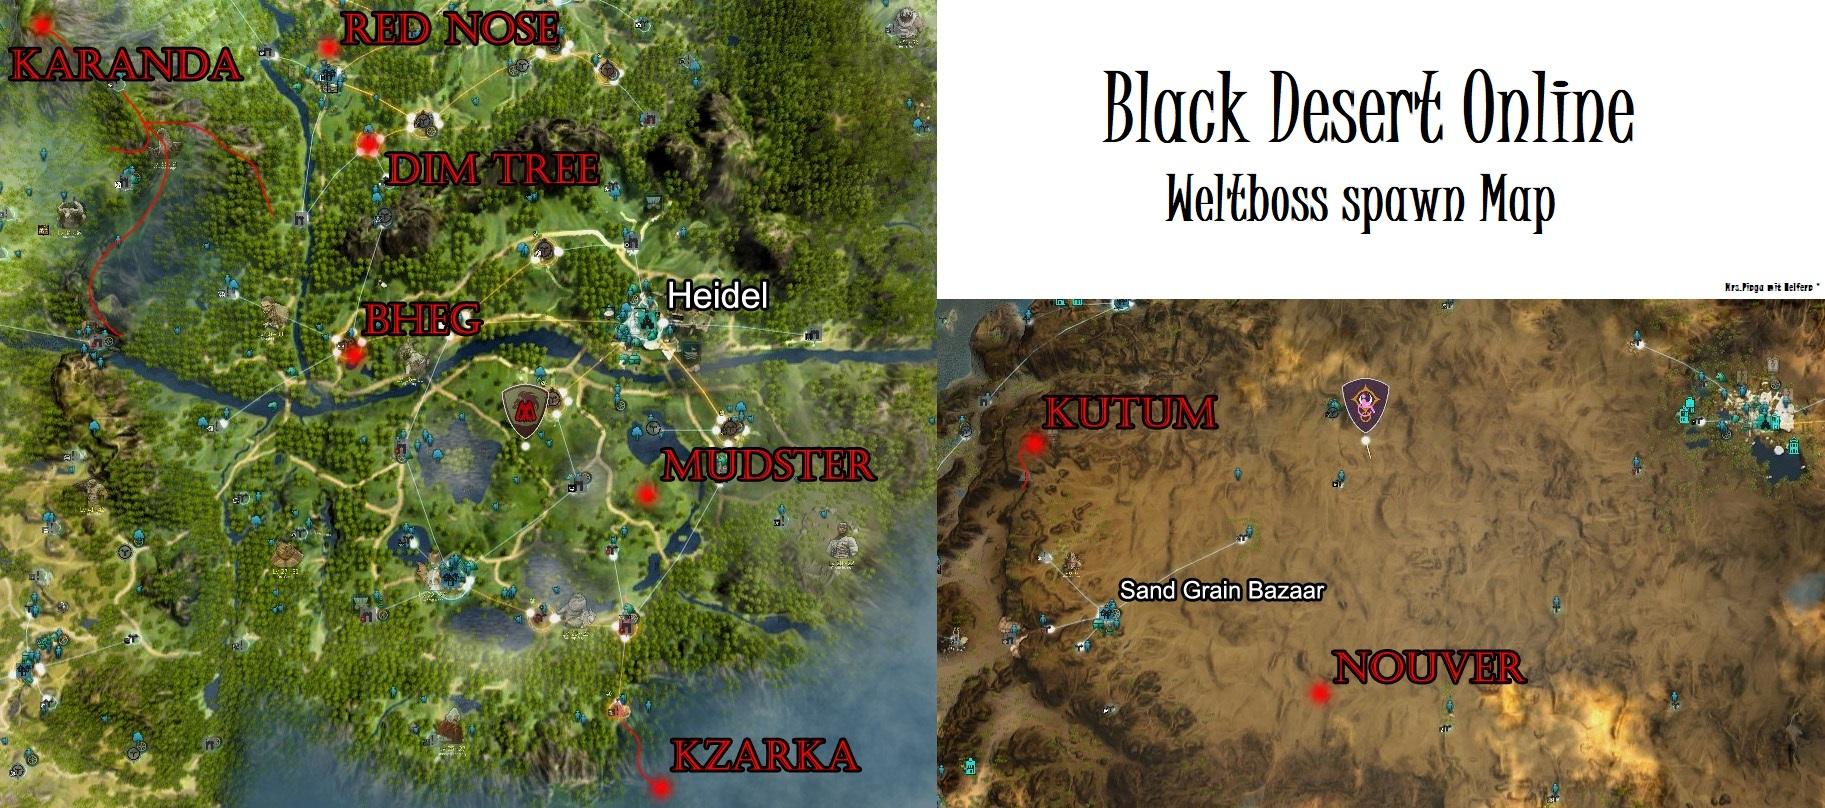 Steam Community :: Guide :: [GER] Rund um Black Desert